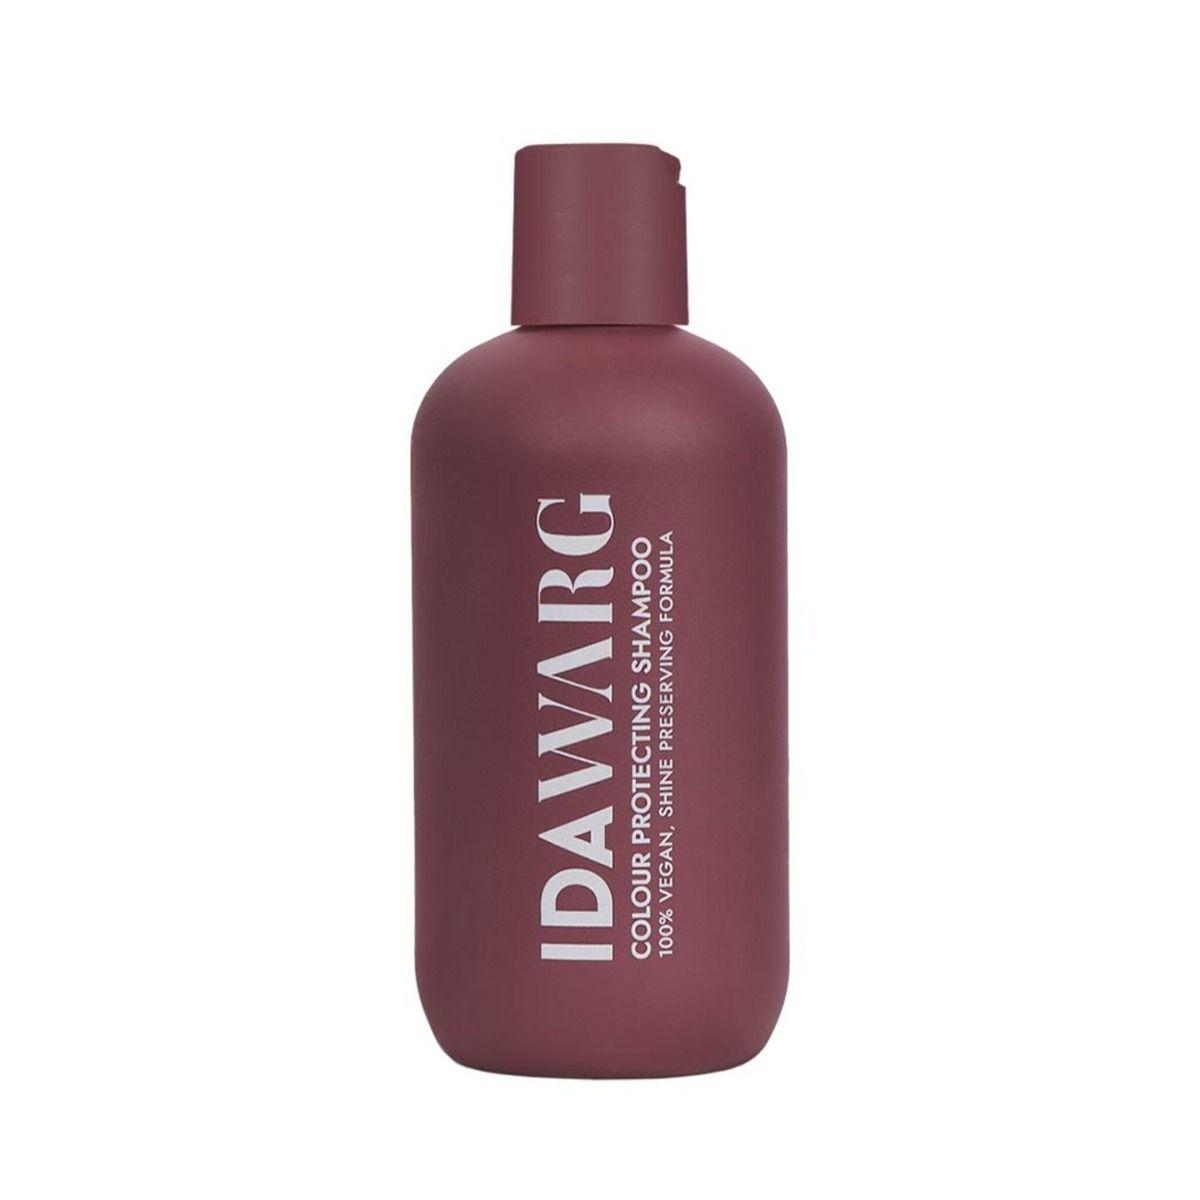 Ida Warg Colour Protecting Shampoo 250ml